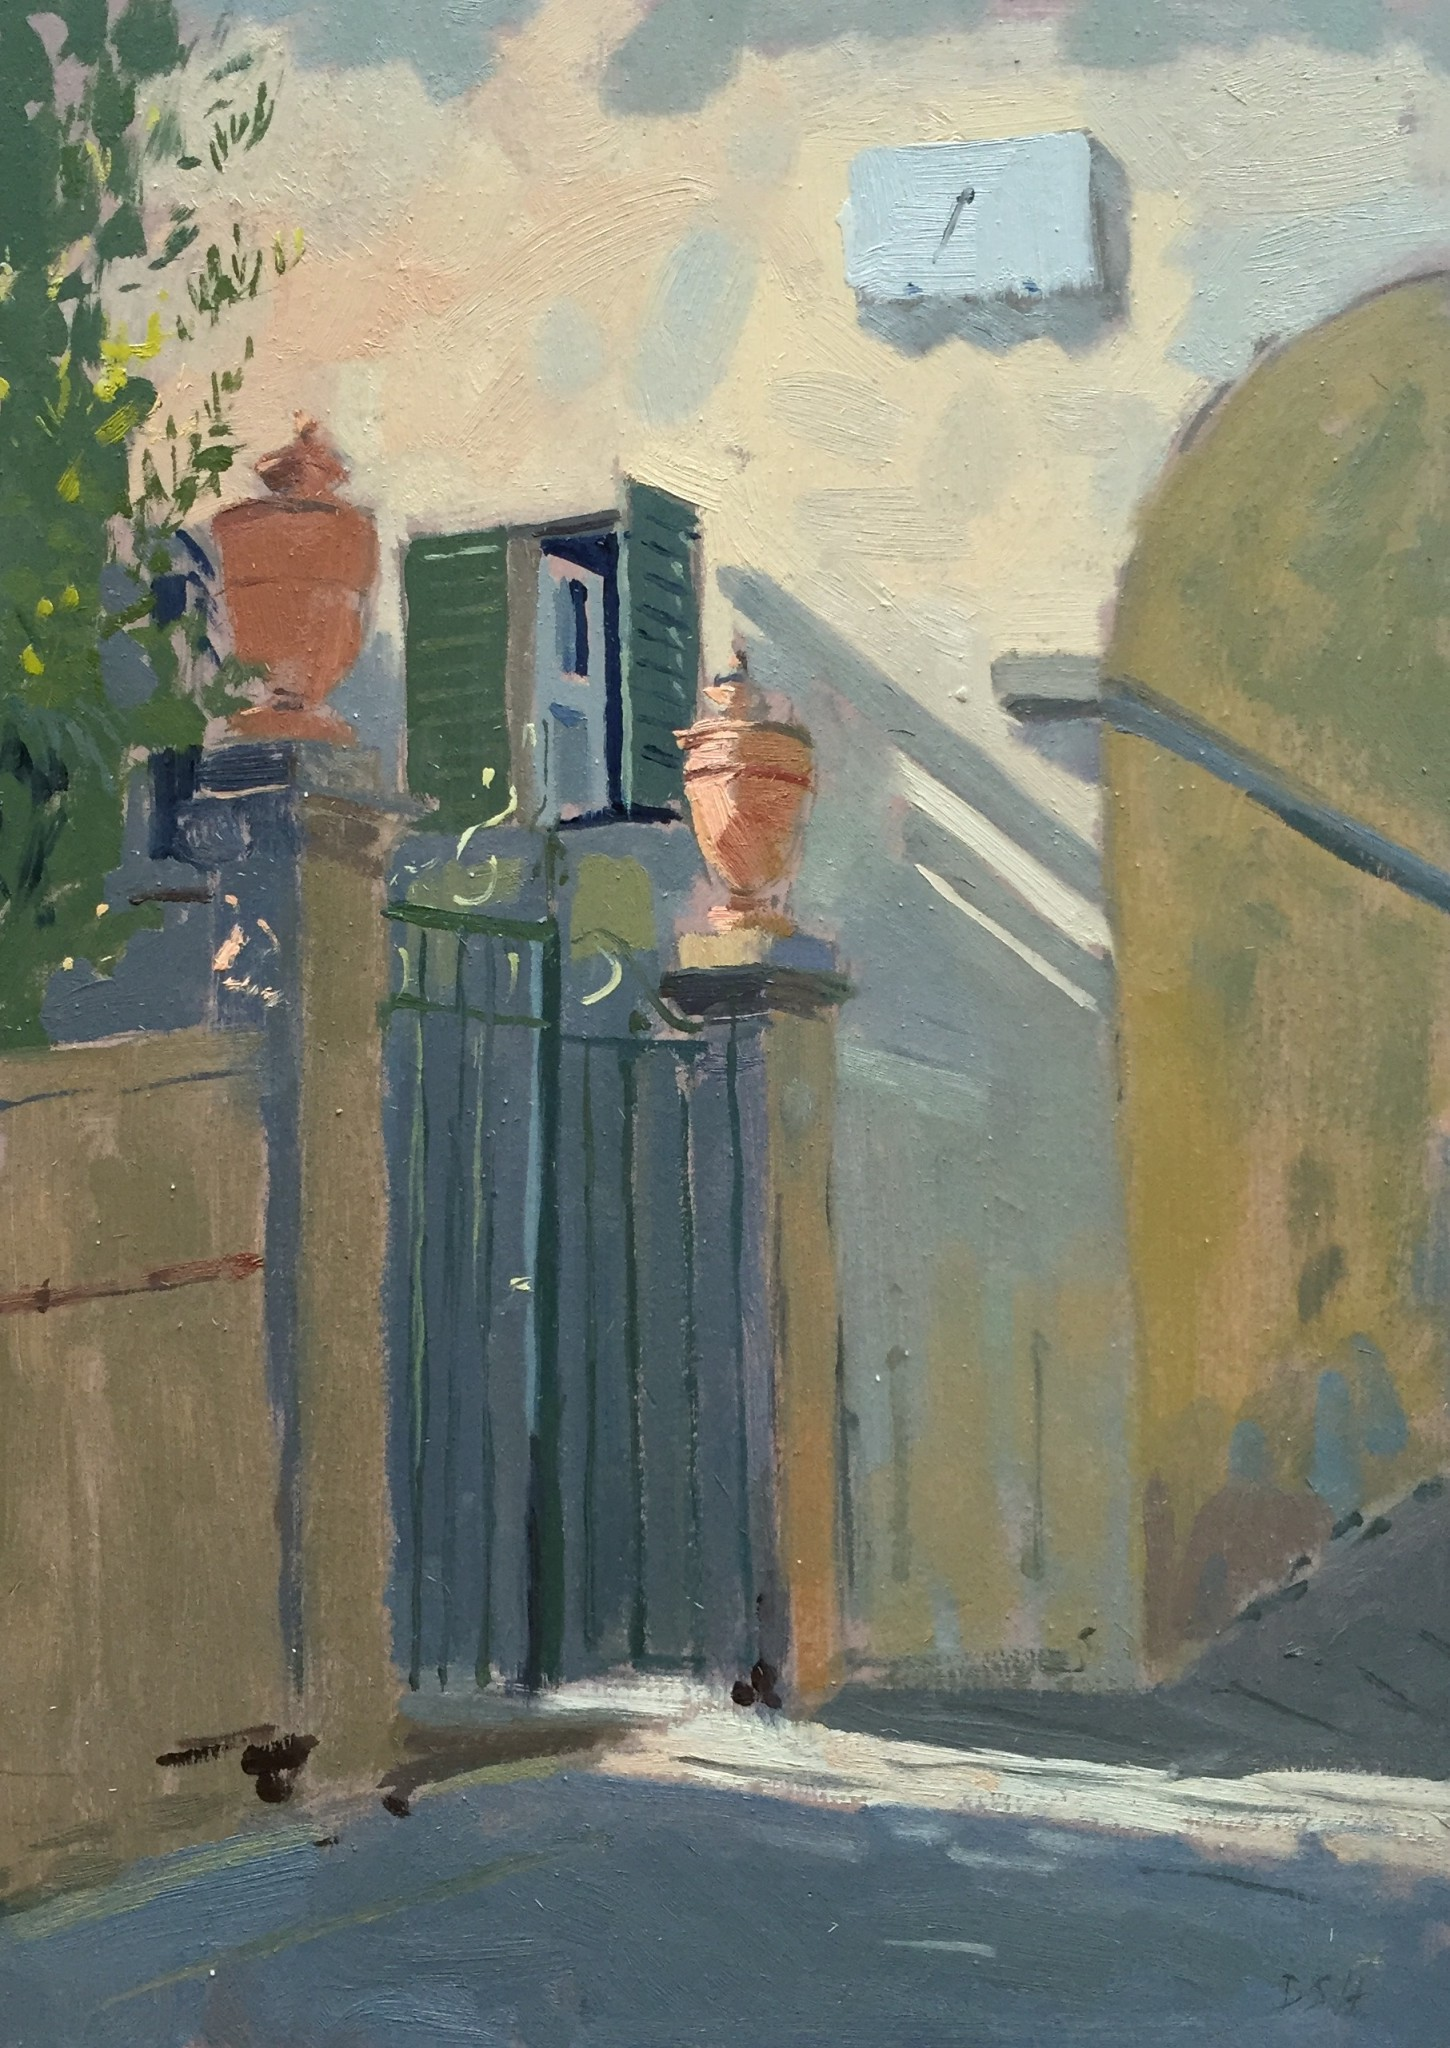 Afternoon Light Creeping through the Gate at Panzano